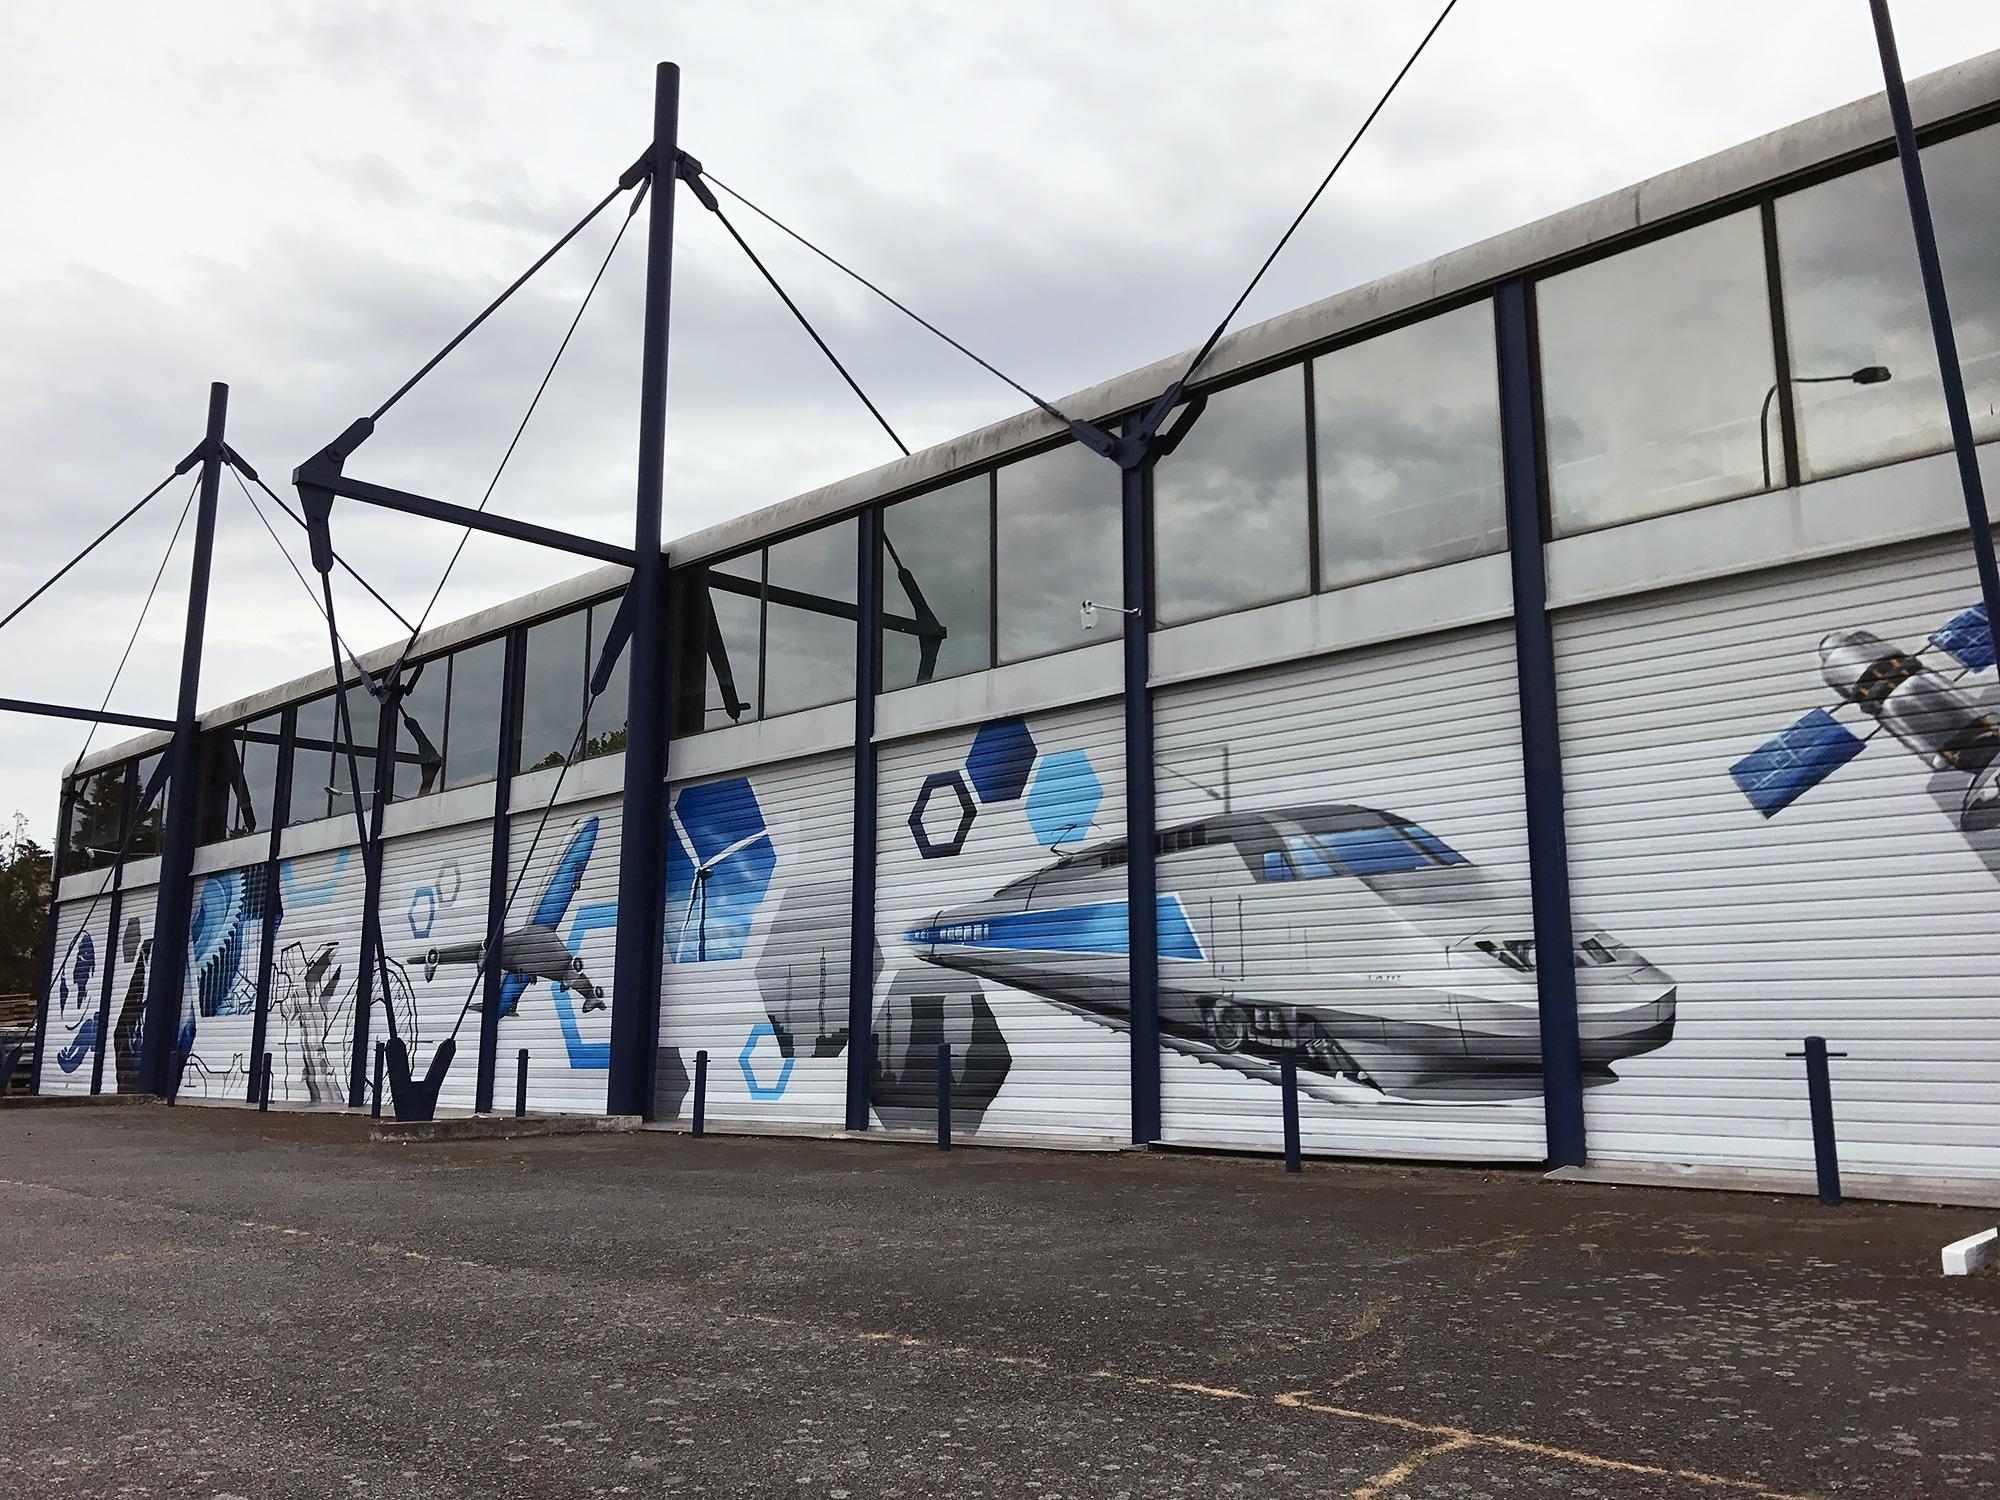 OREXAD-Fresque-Aeronautique-innovation-train